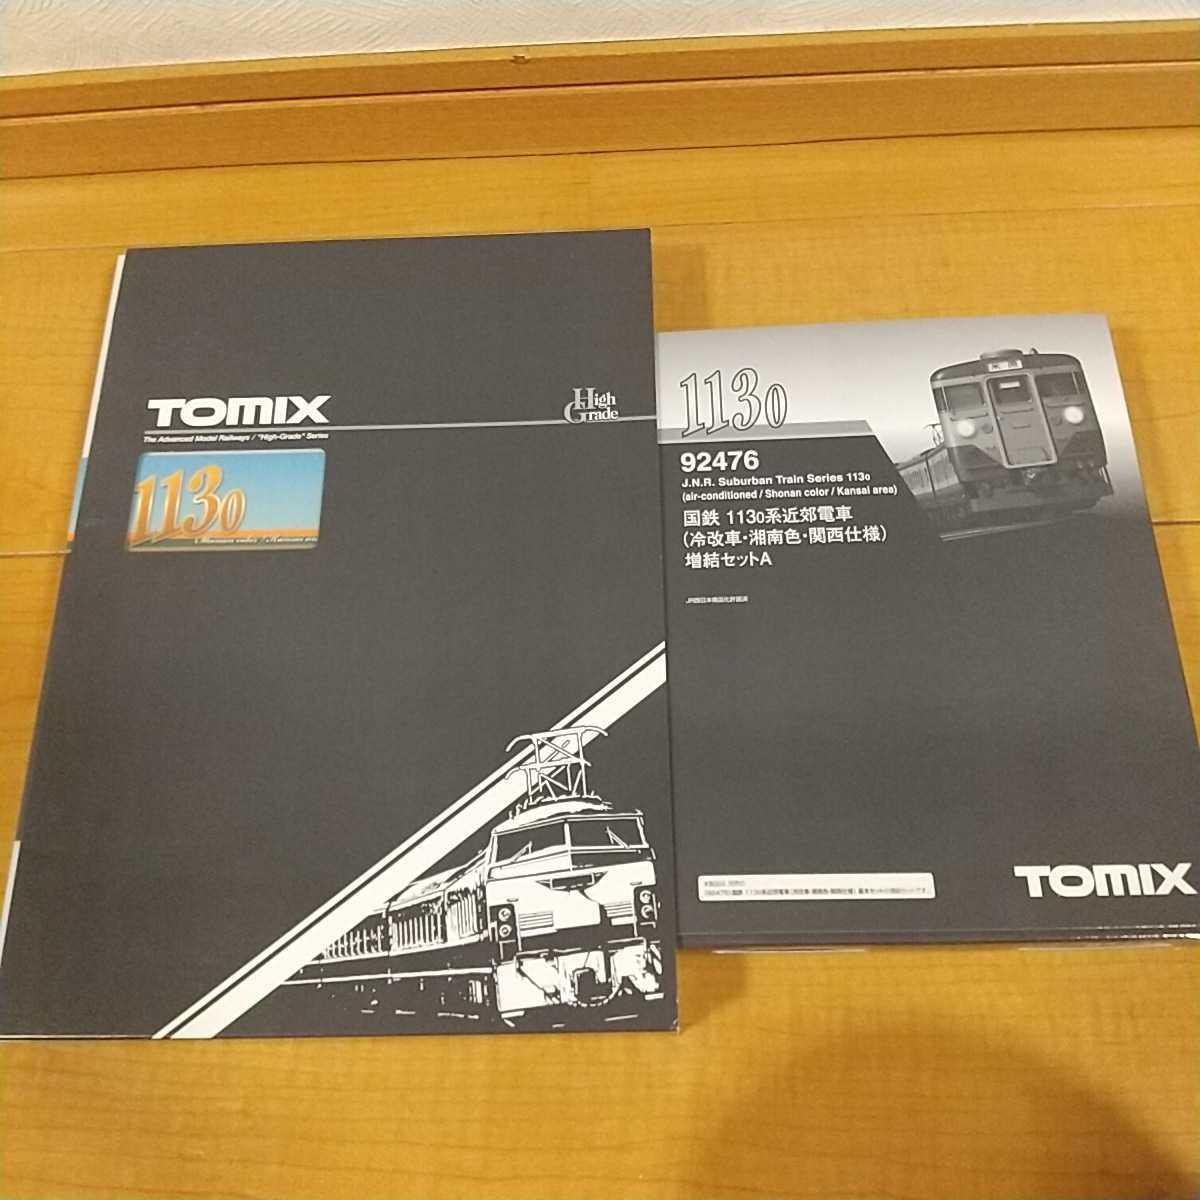 TOMIX 国鉄113 0系近郊電車(冷改車・湘南色・関西仕様)基本セット&増結セットA